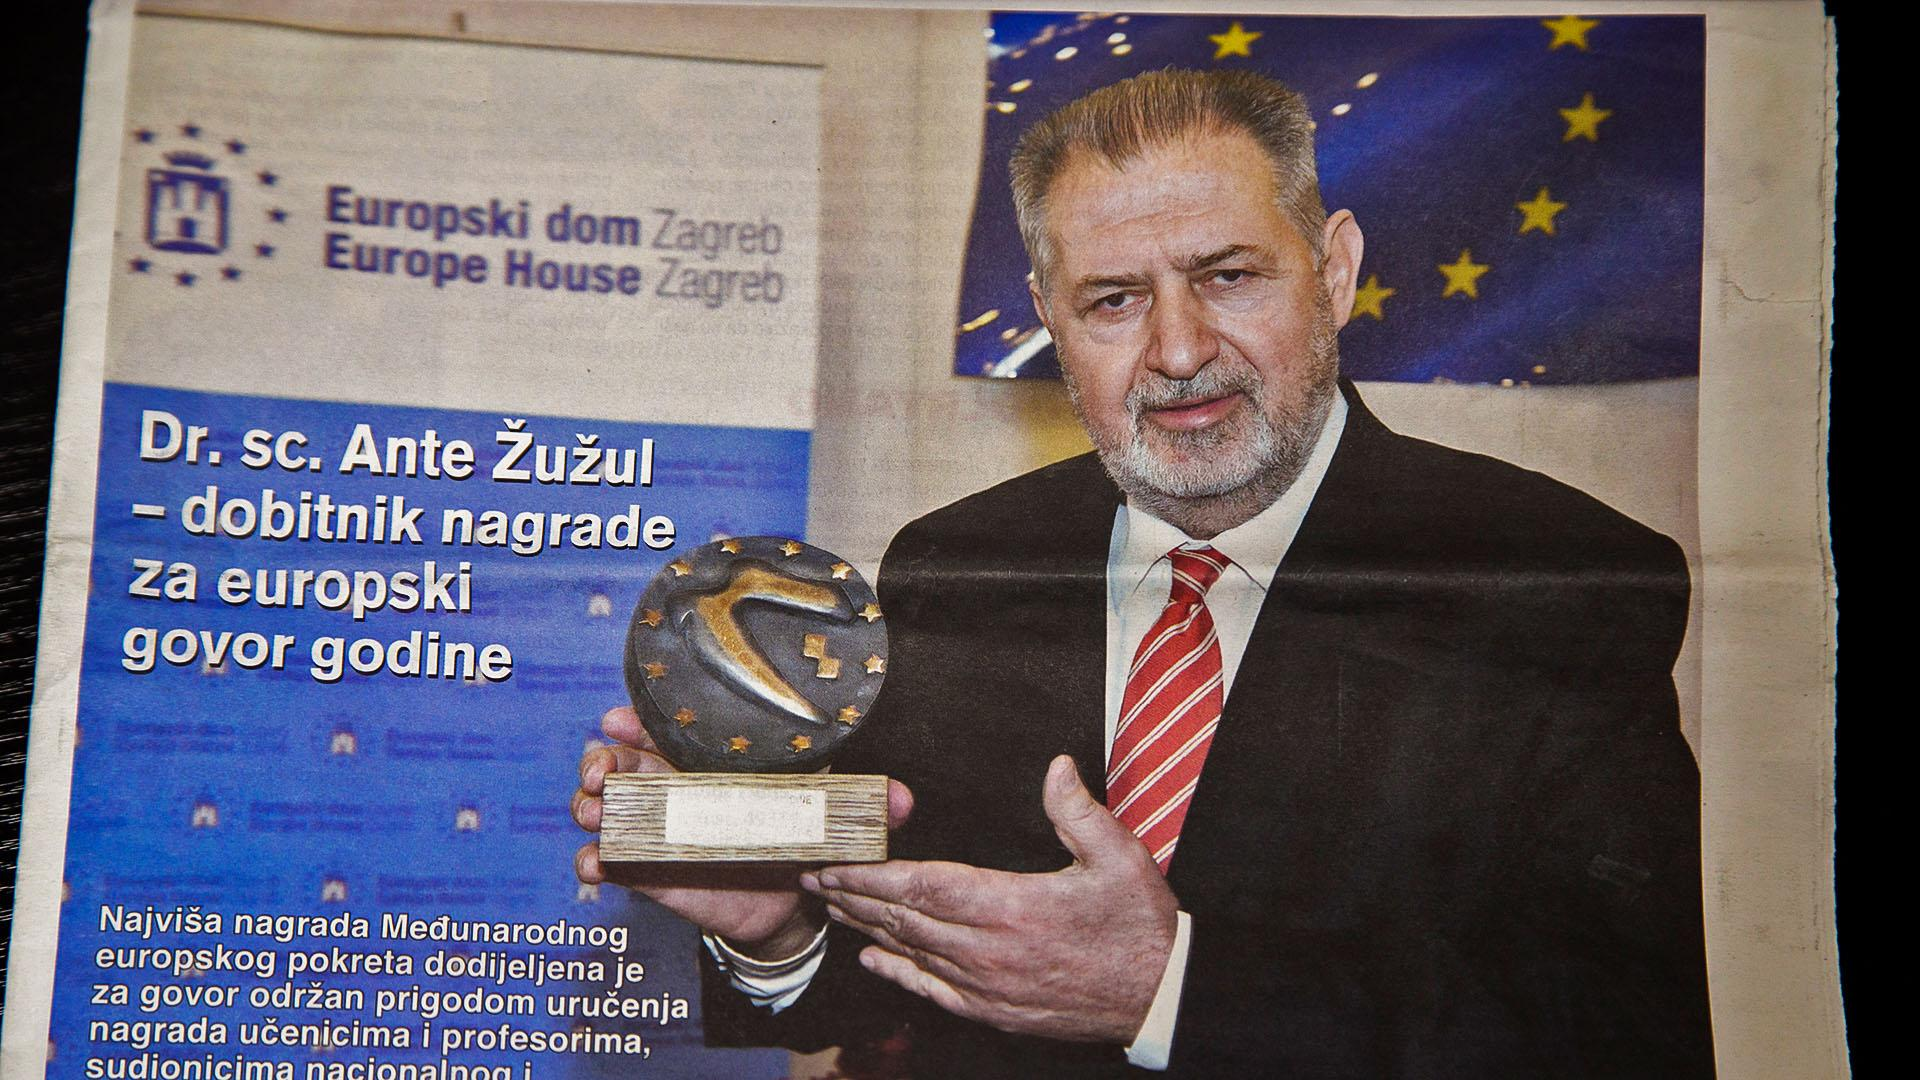 Dr.sc. Ante Žužul - dobitnik nagrade za europski govor godine